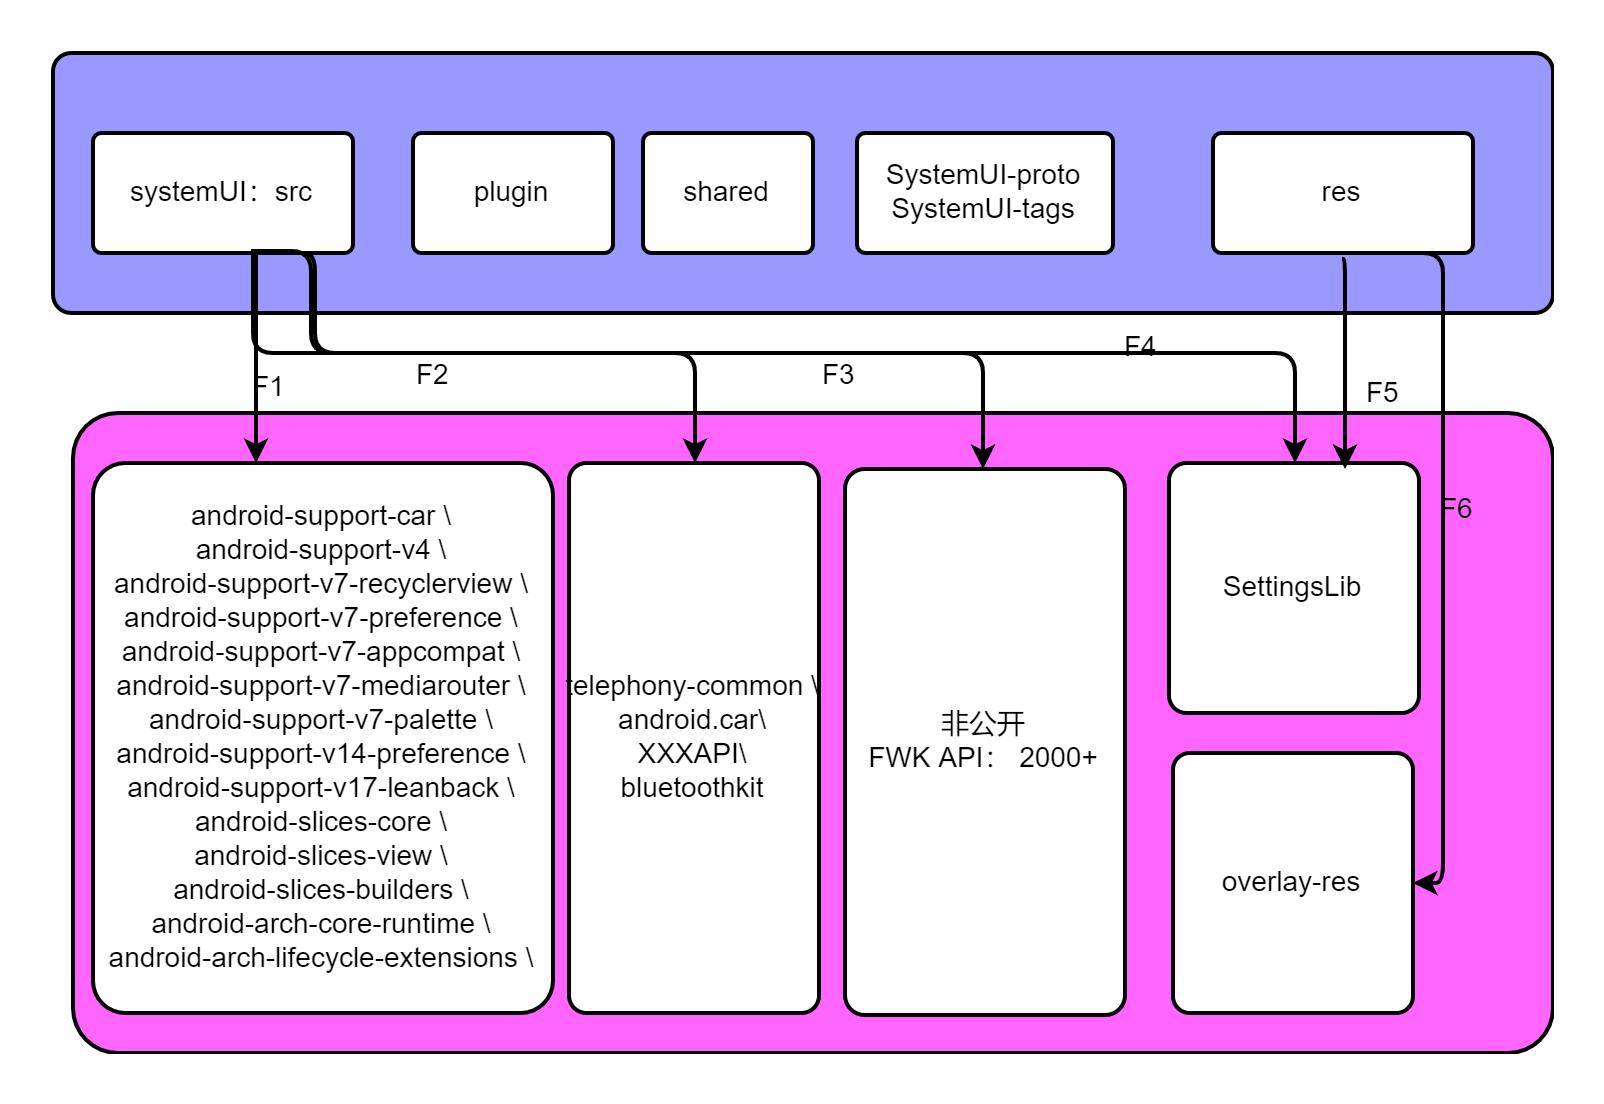 SystemUI 源码编译切换为 Android Studio 独立编译